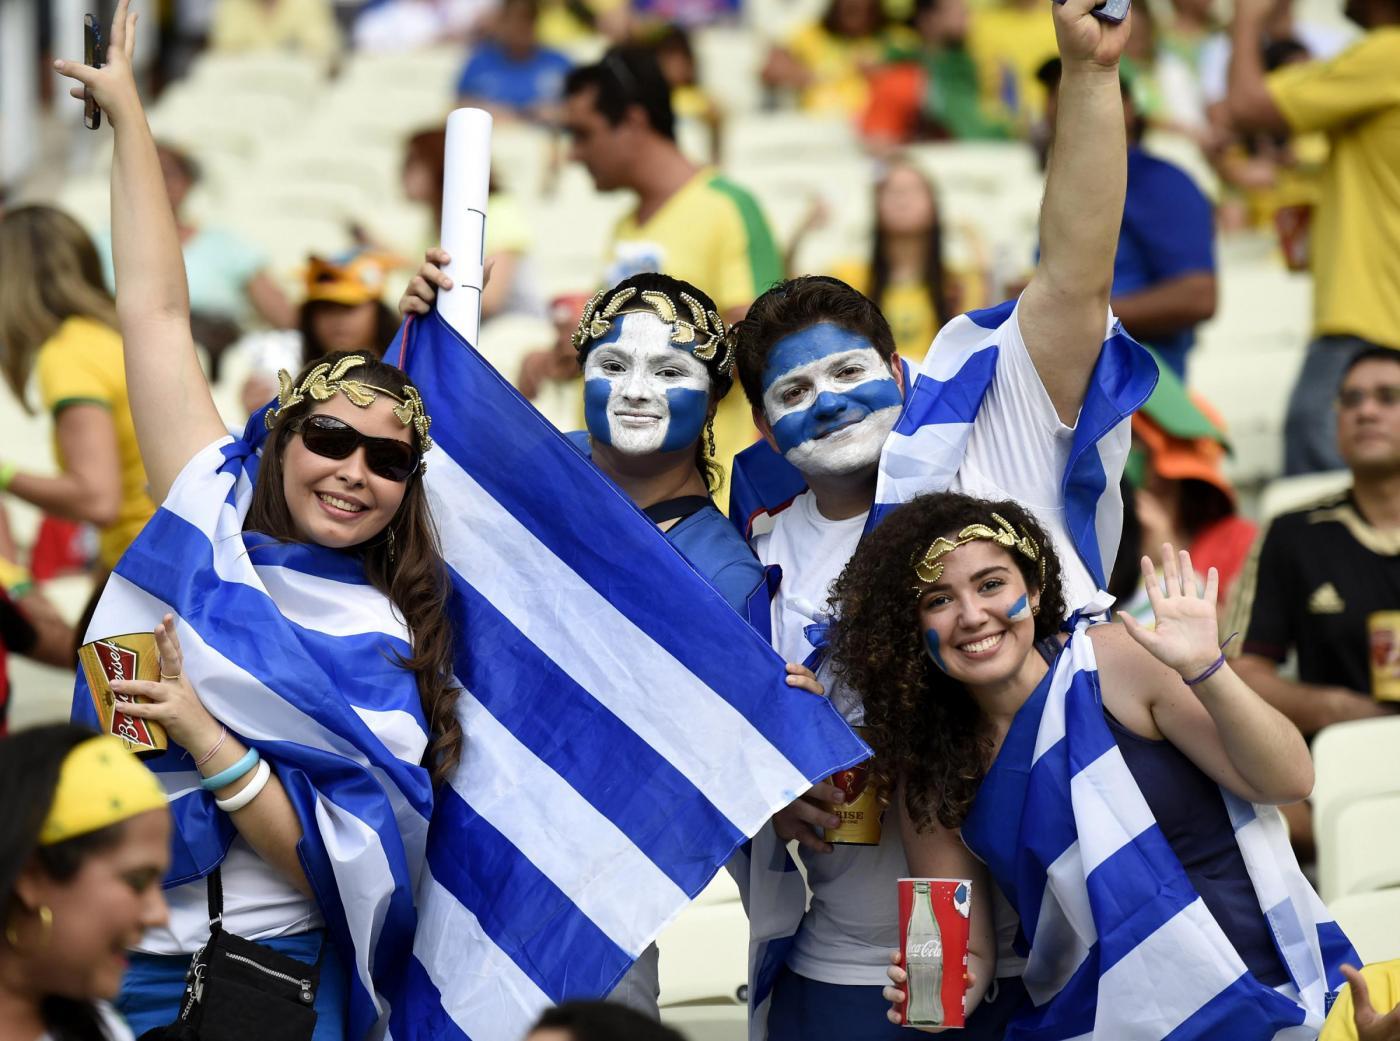 Grecia Football League mercoledì 17 aprile: in Grecia 28ma giornata della Football League, seconda divisione. Volos primo a 57, +8 sul Platanias